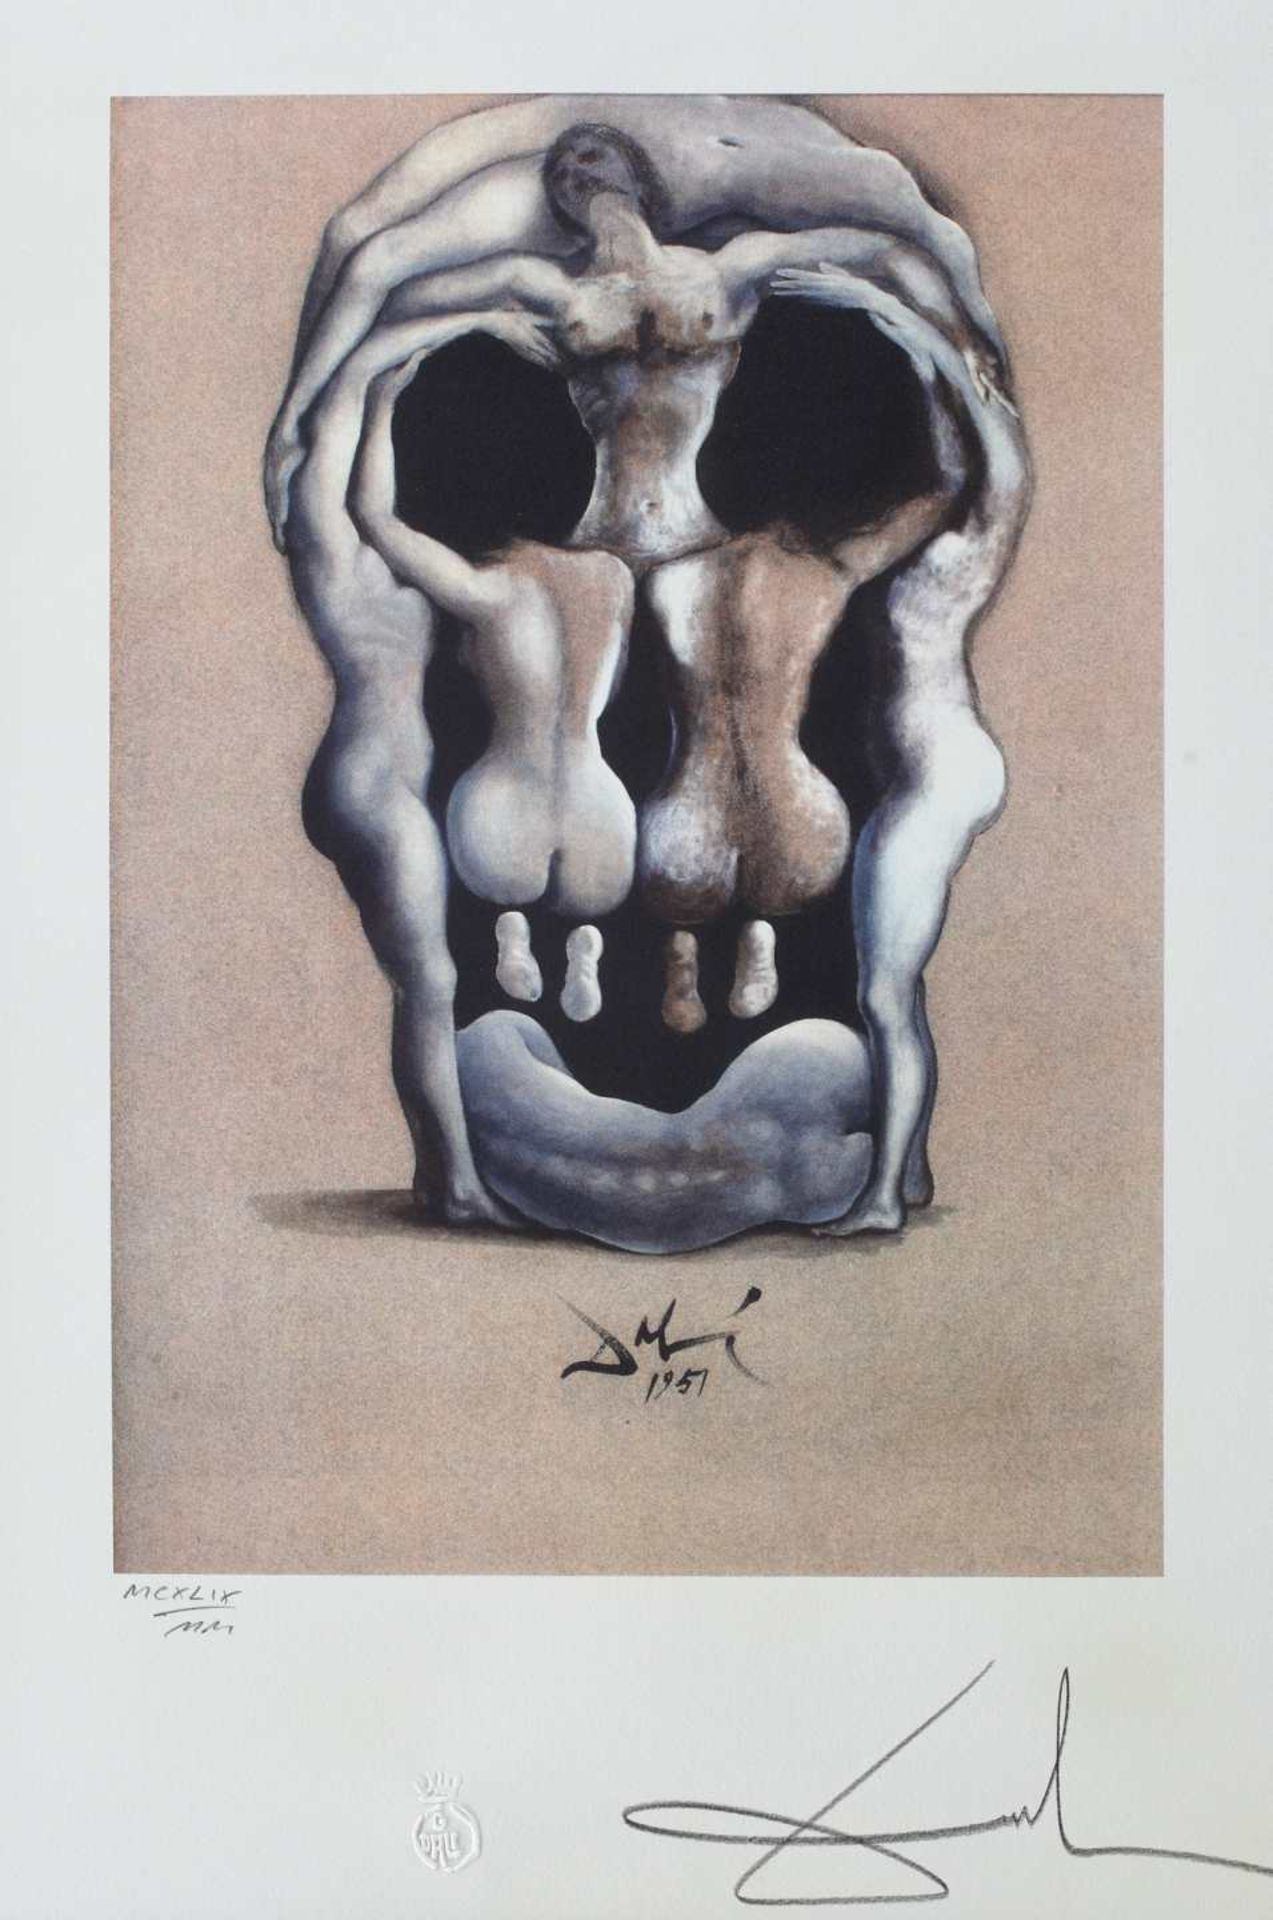 Salvador Dali, SkullSalvador Dali, Skull, chromolithography, 43 × 30 cm, signed and dated, eng